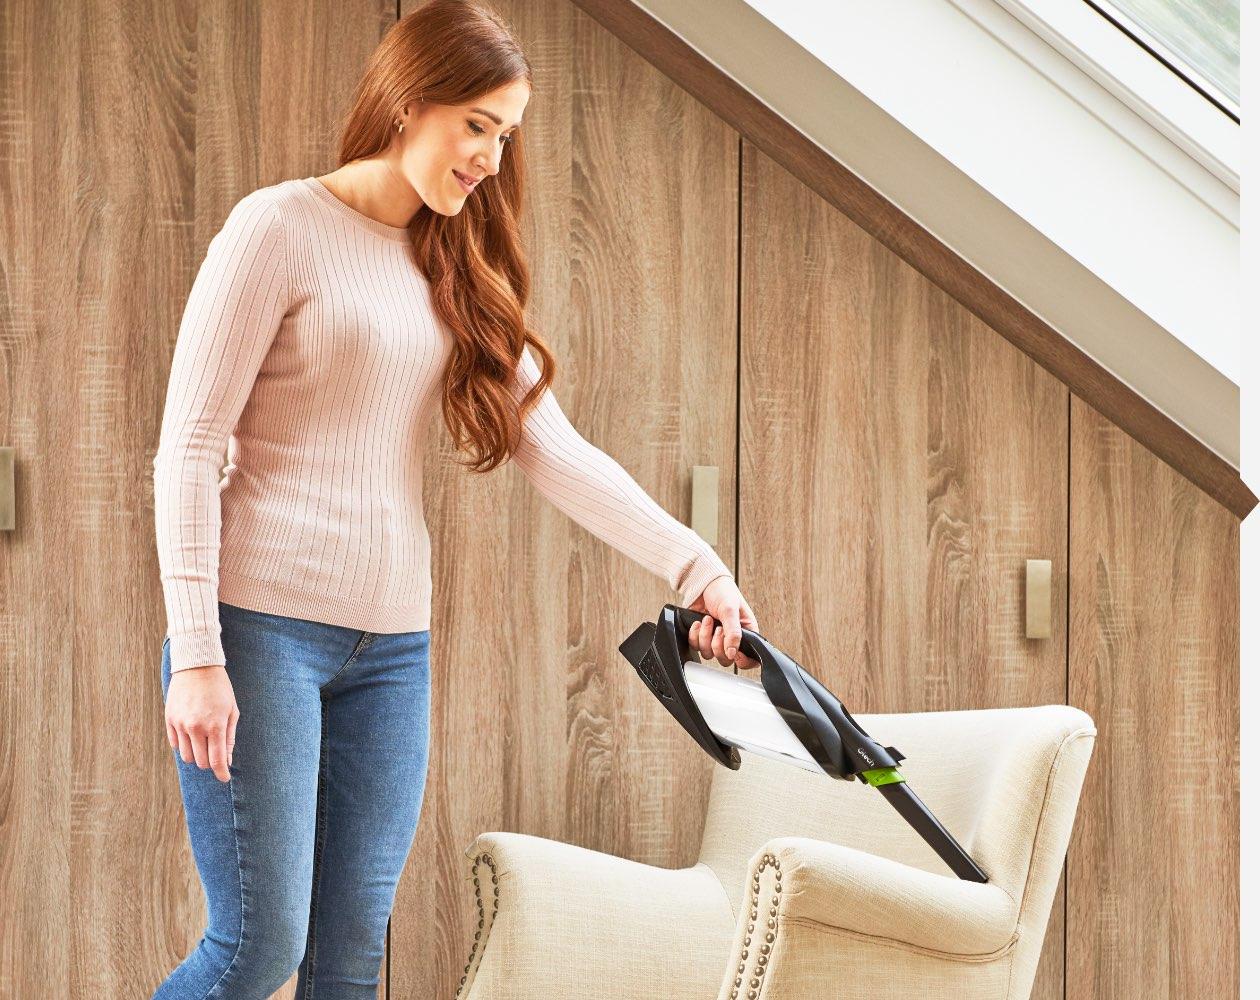 ProLite handheld vacuum crevice tool on upholstery